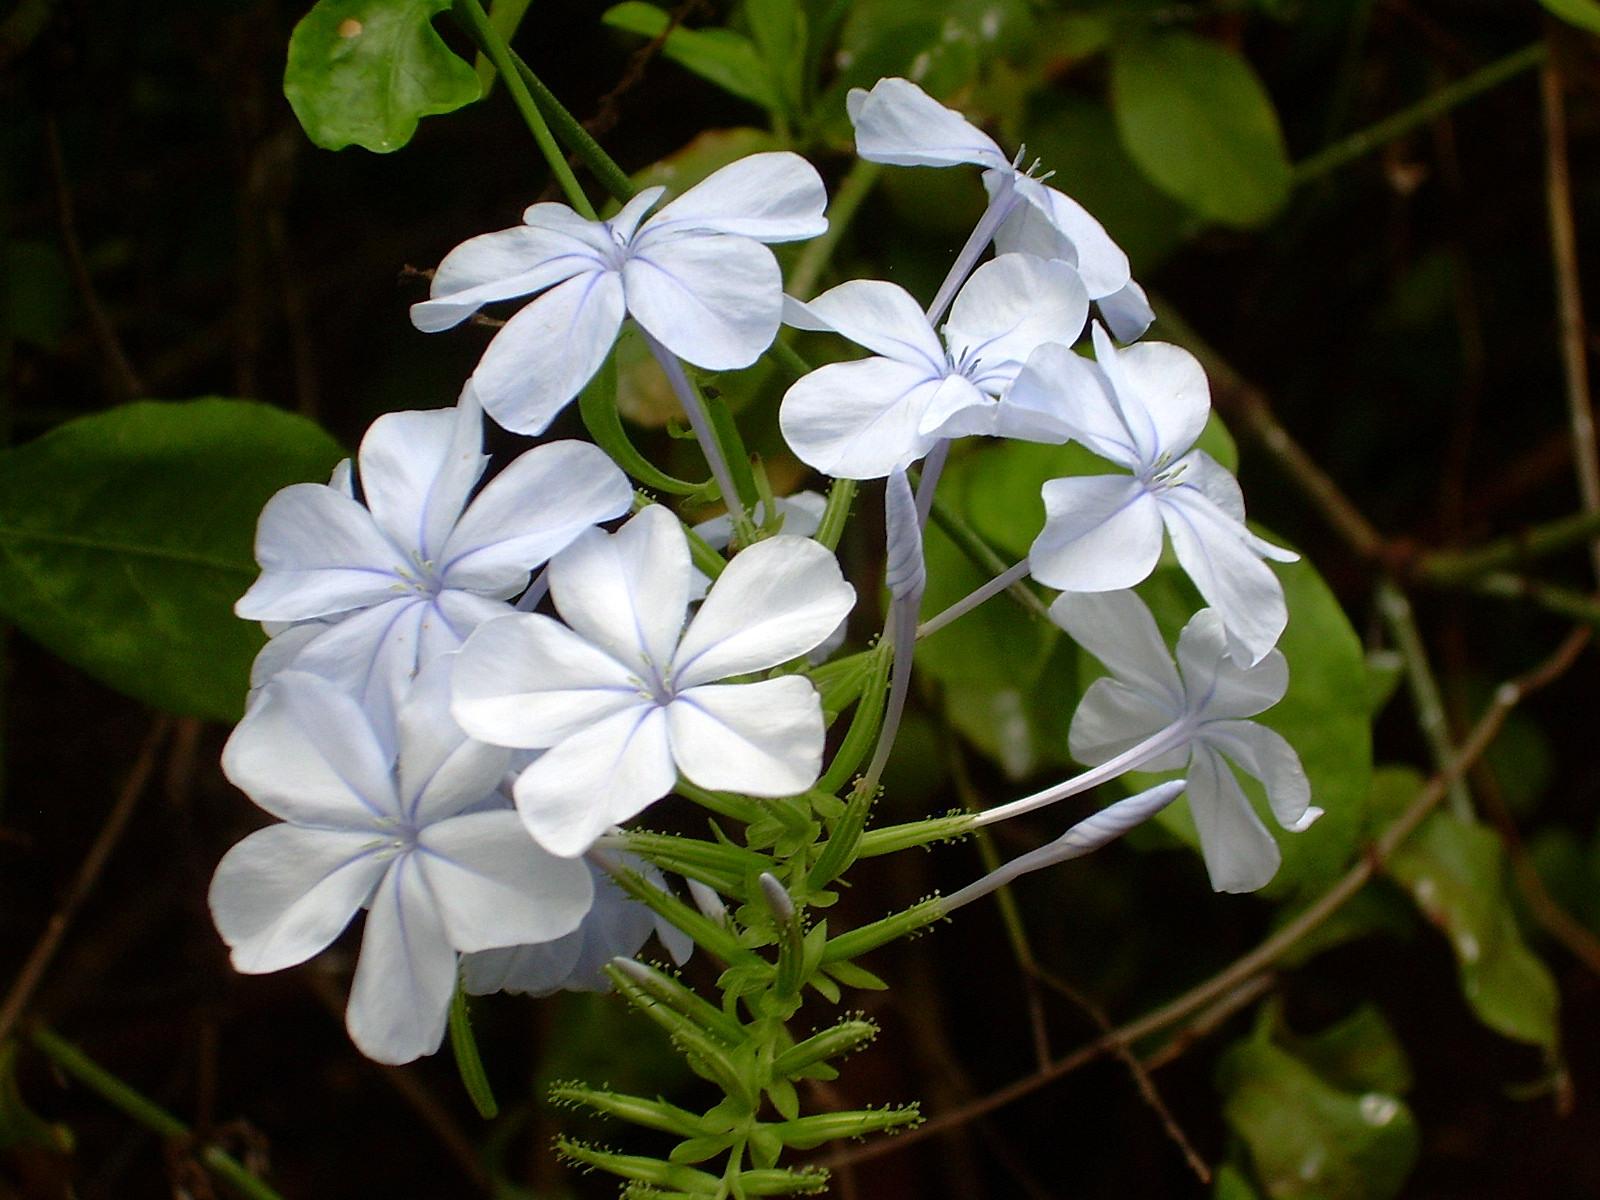 Blue flowers01.JPG © ErgoSum88